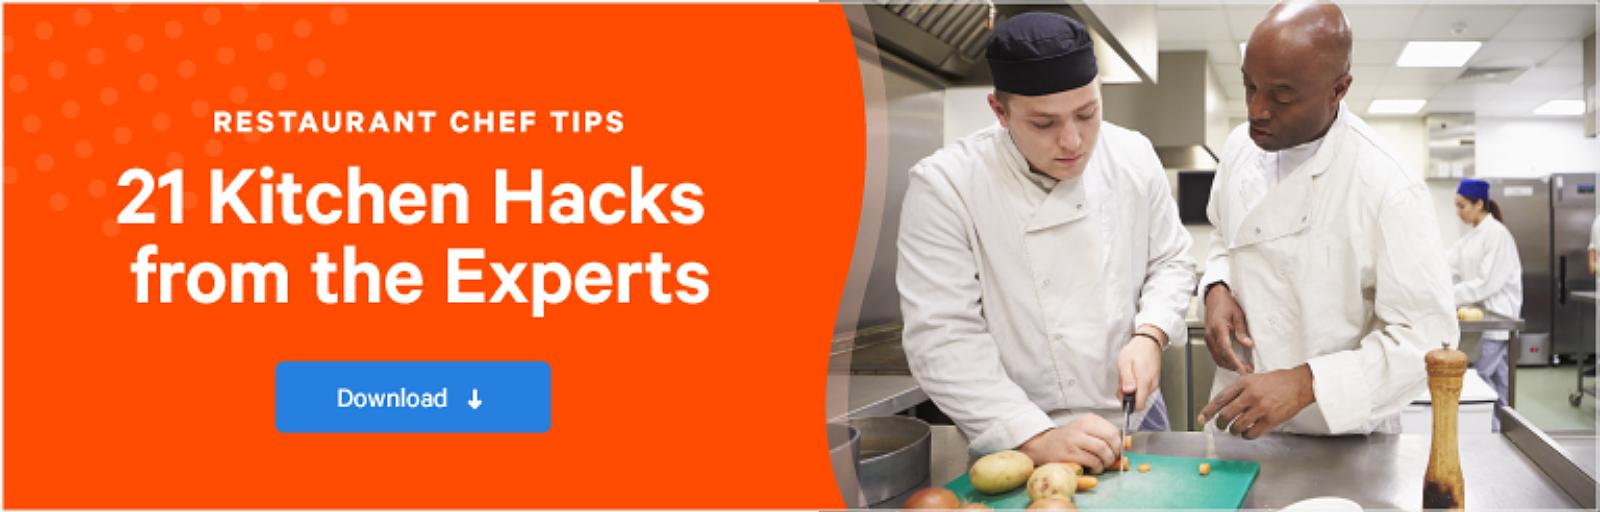 Blog toast ctas kitchenhacks form